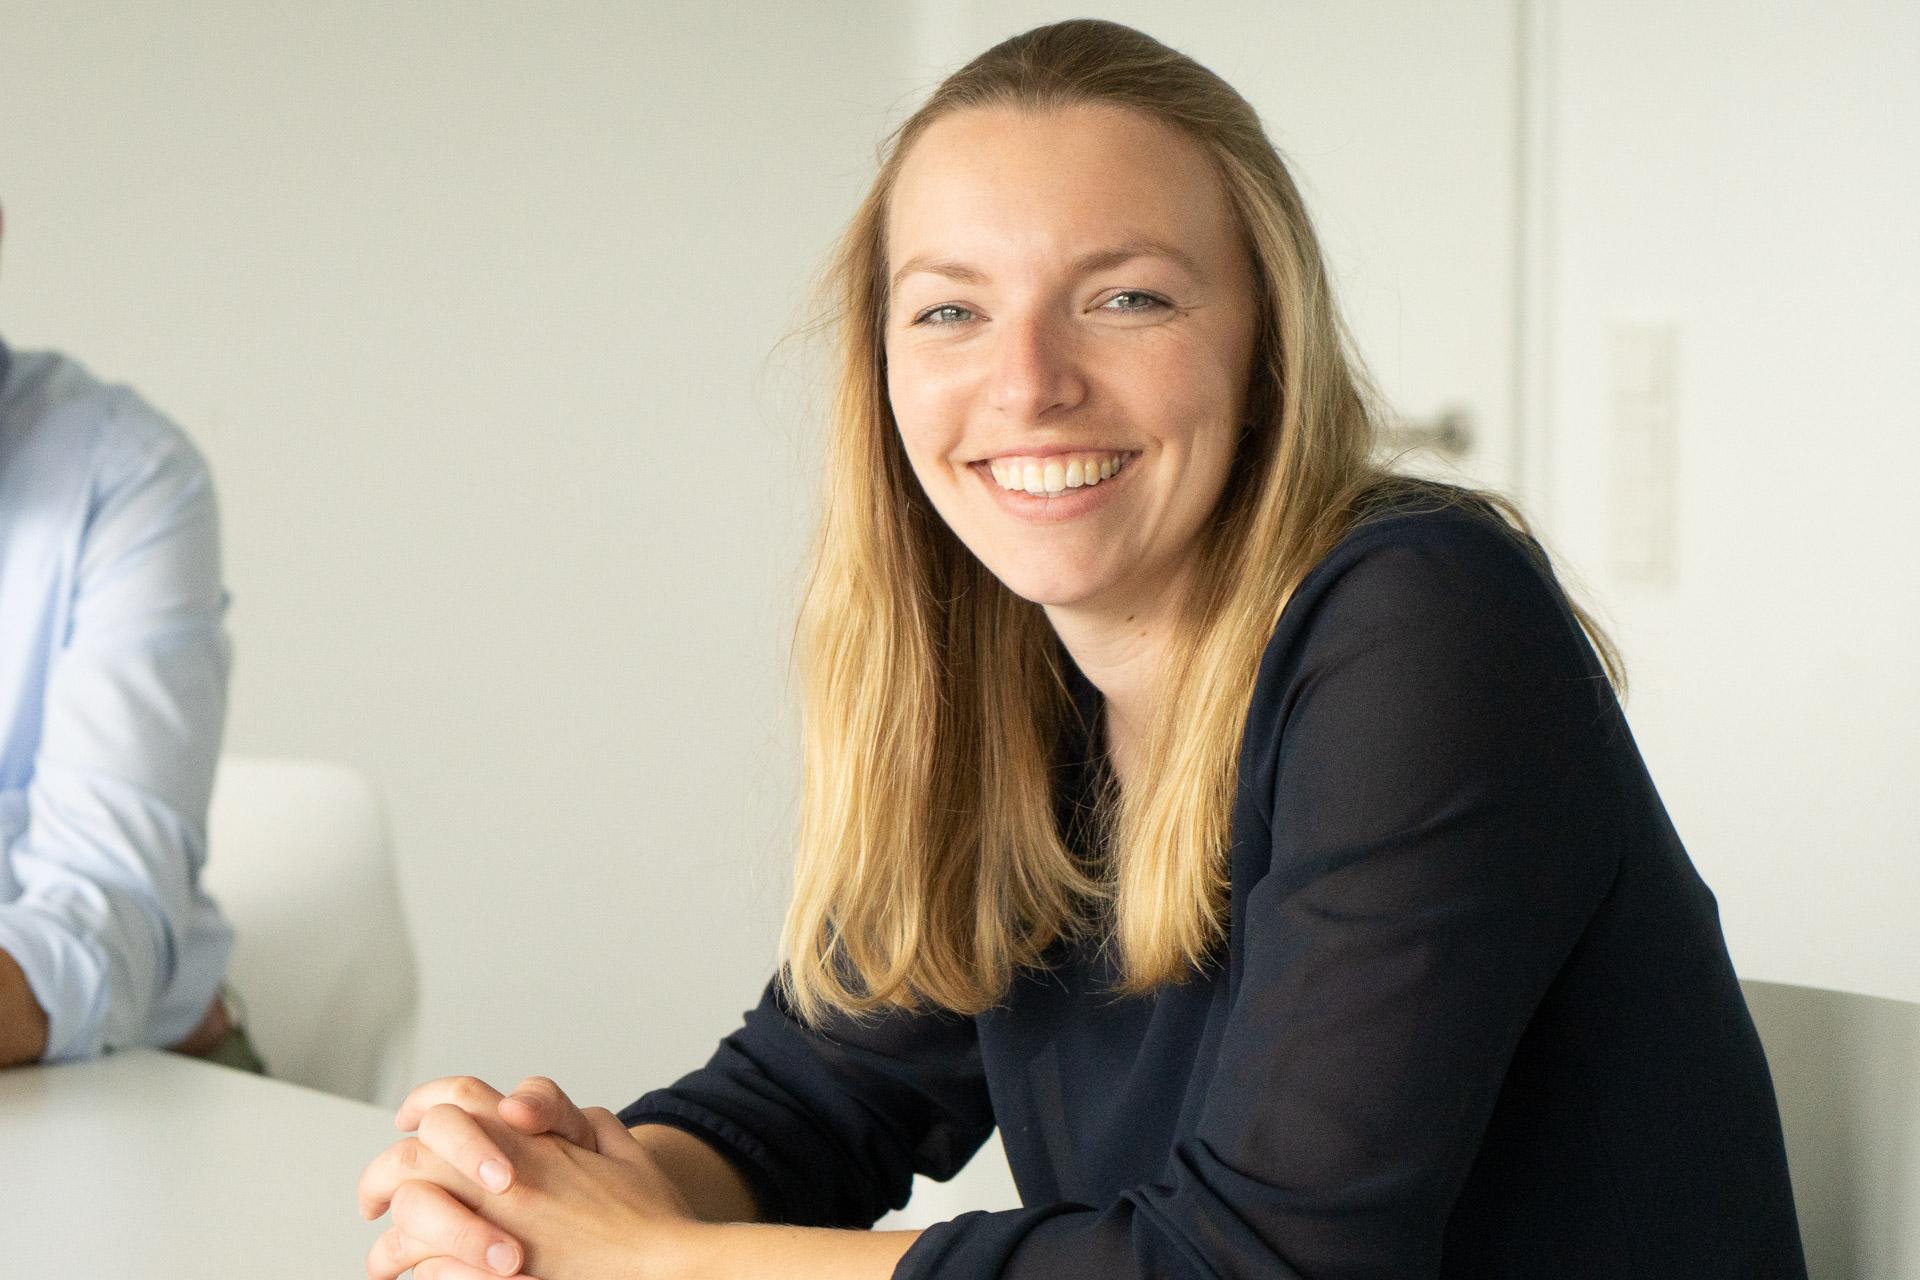 Moduldrei Seminare Ansprechpartnerin Charlotte Holthausen